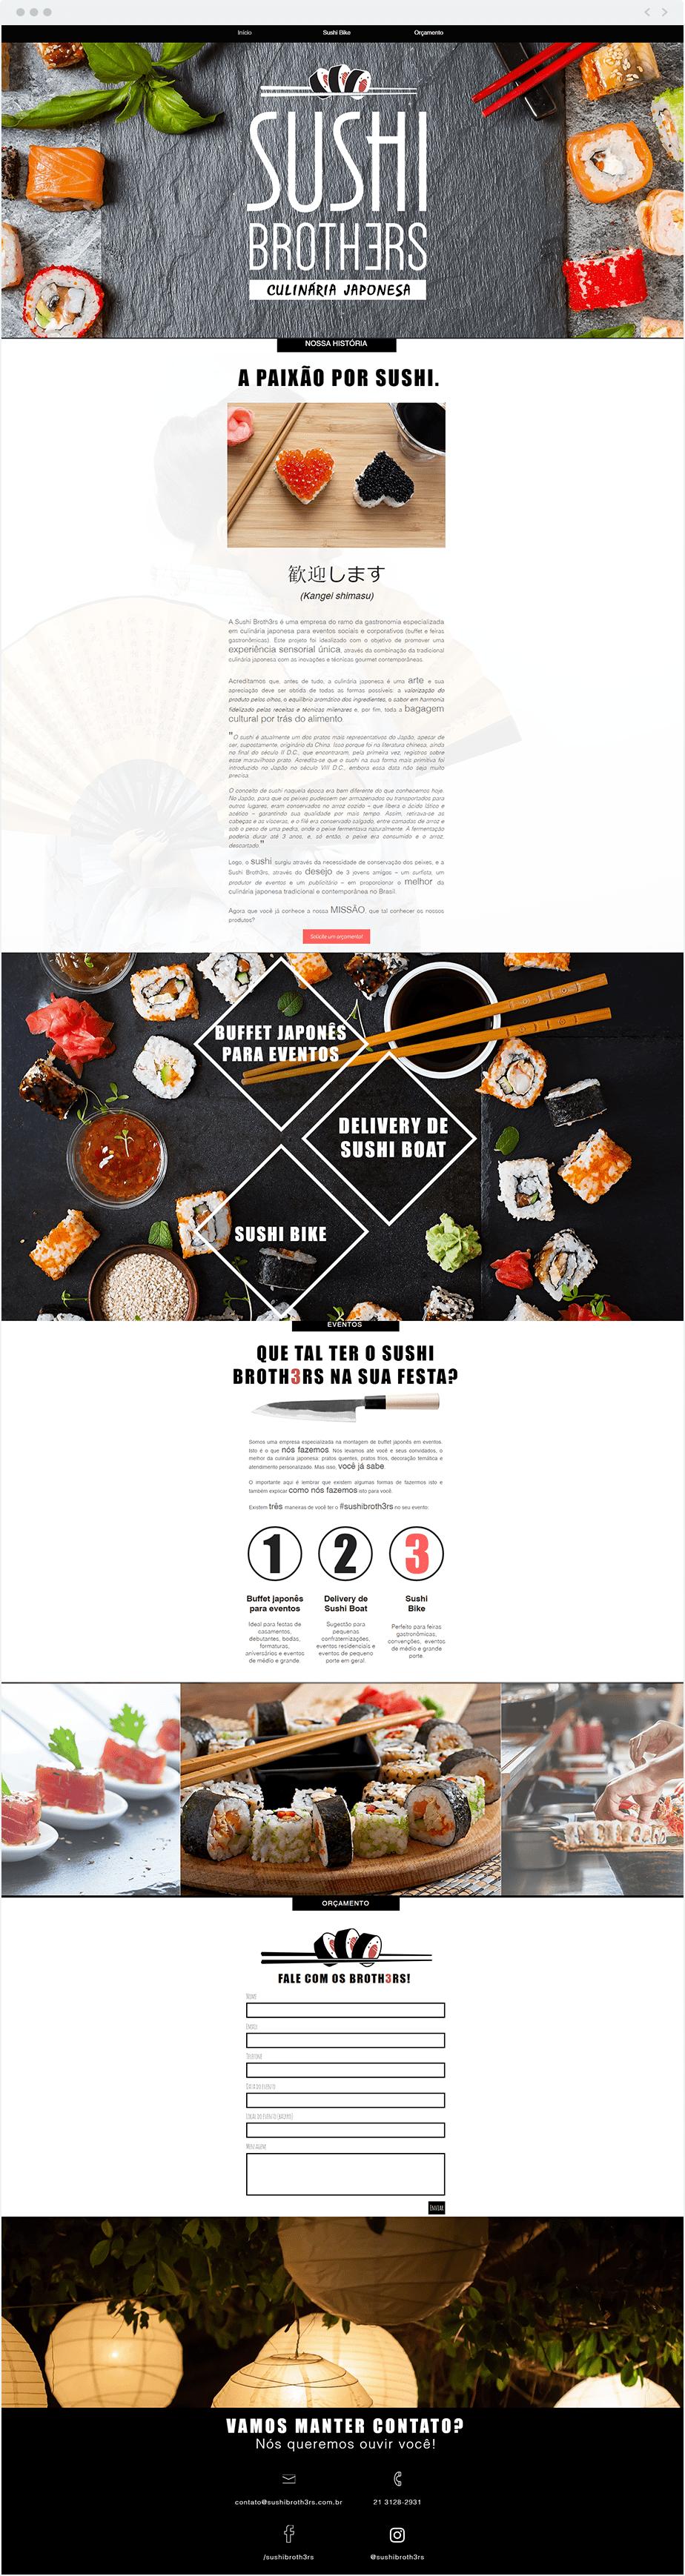 Sushi Broth3ers